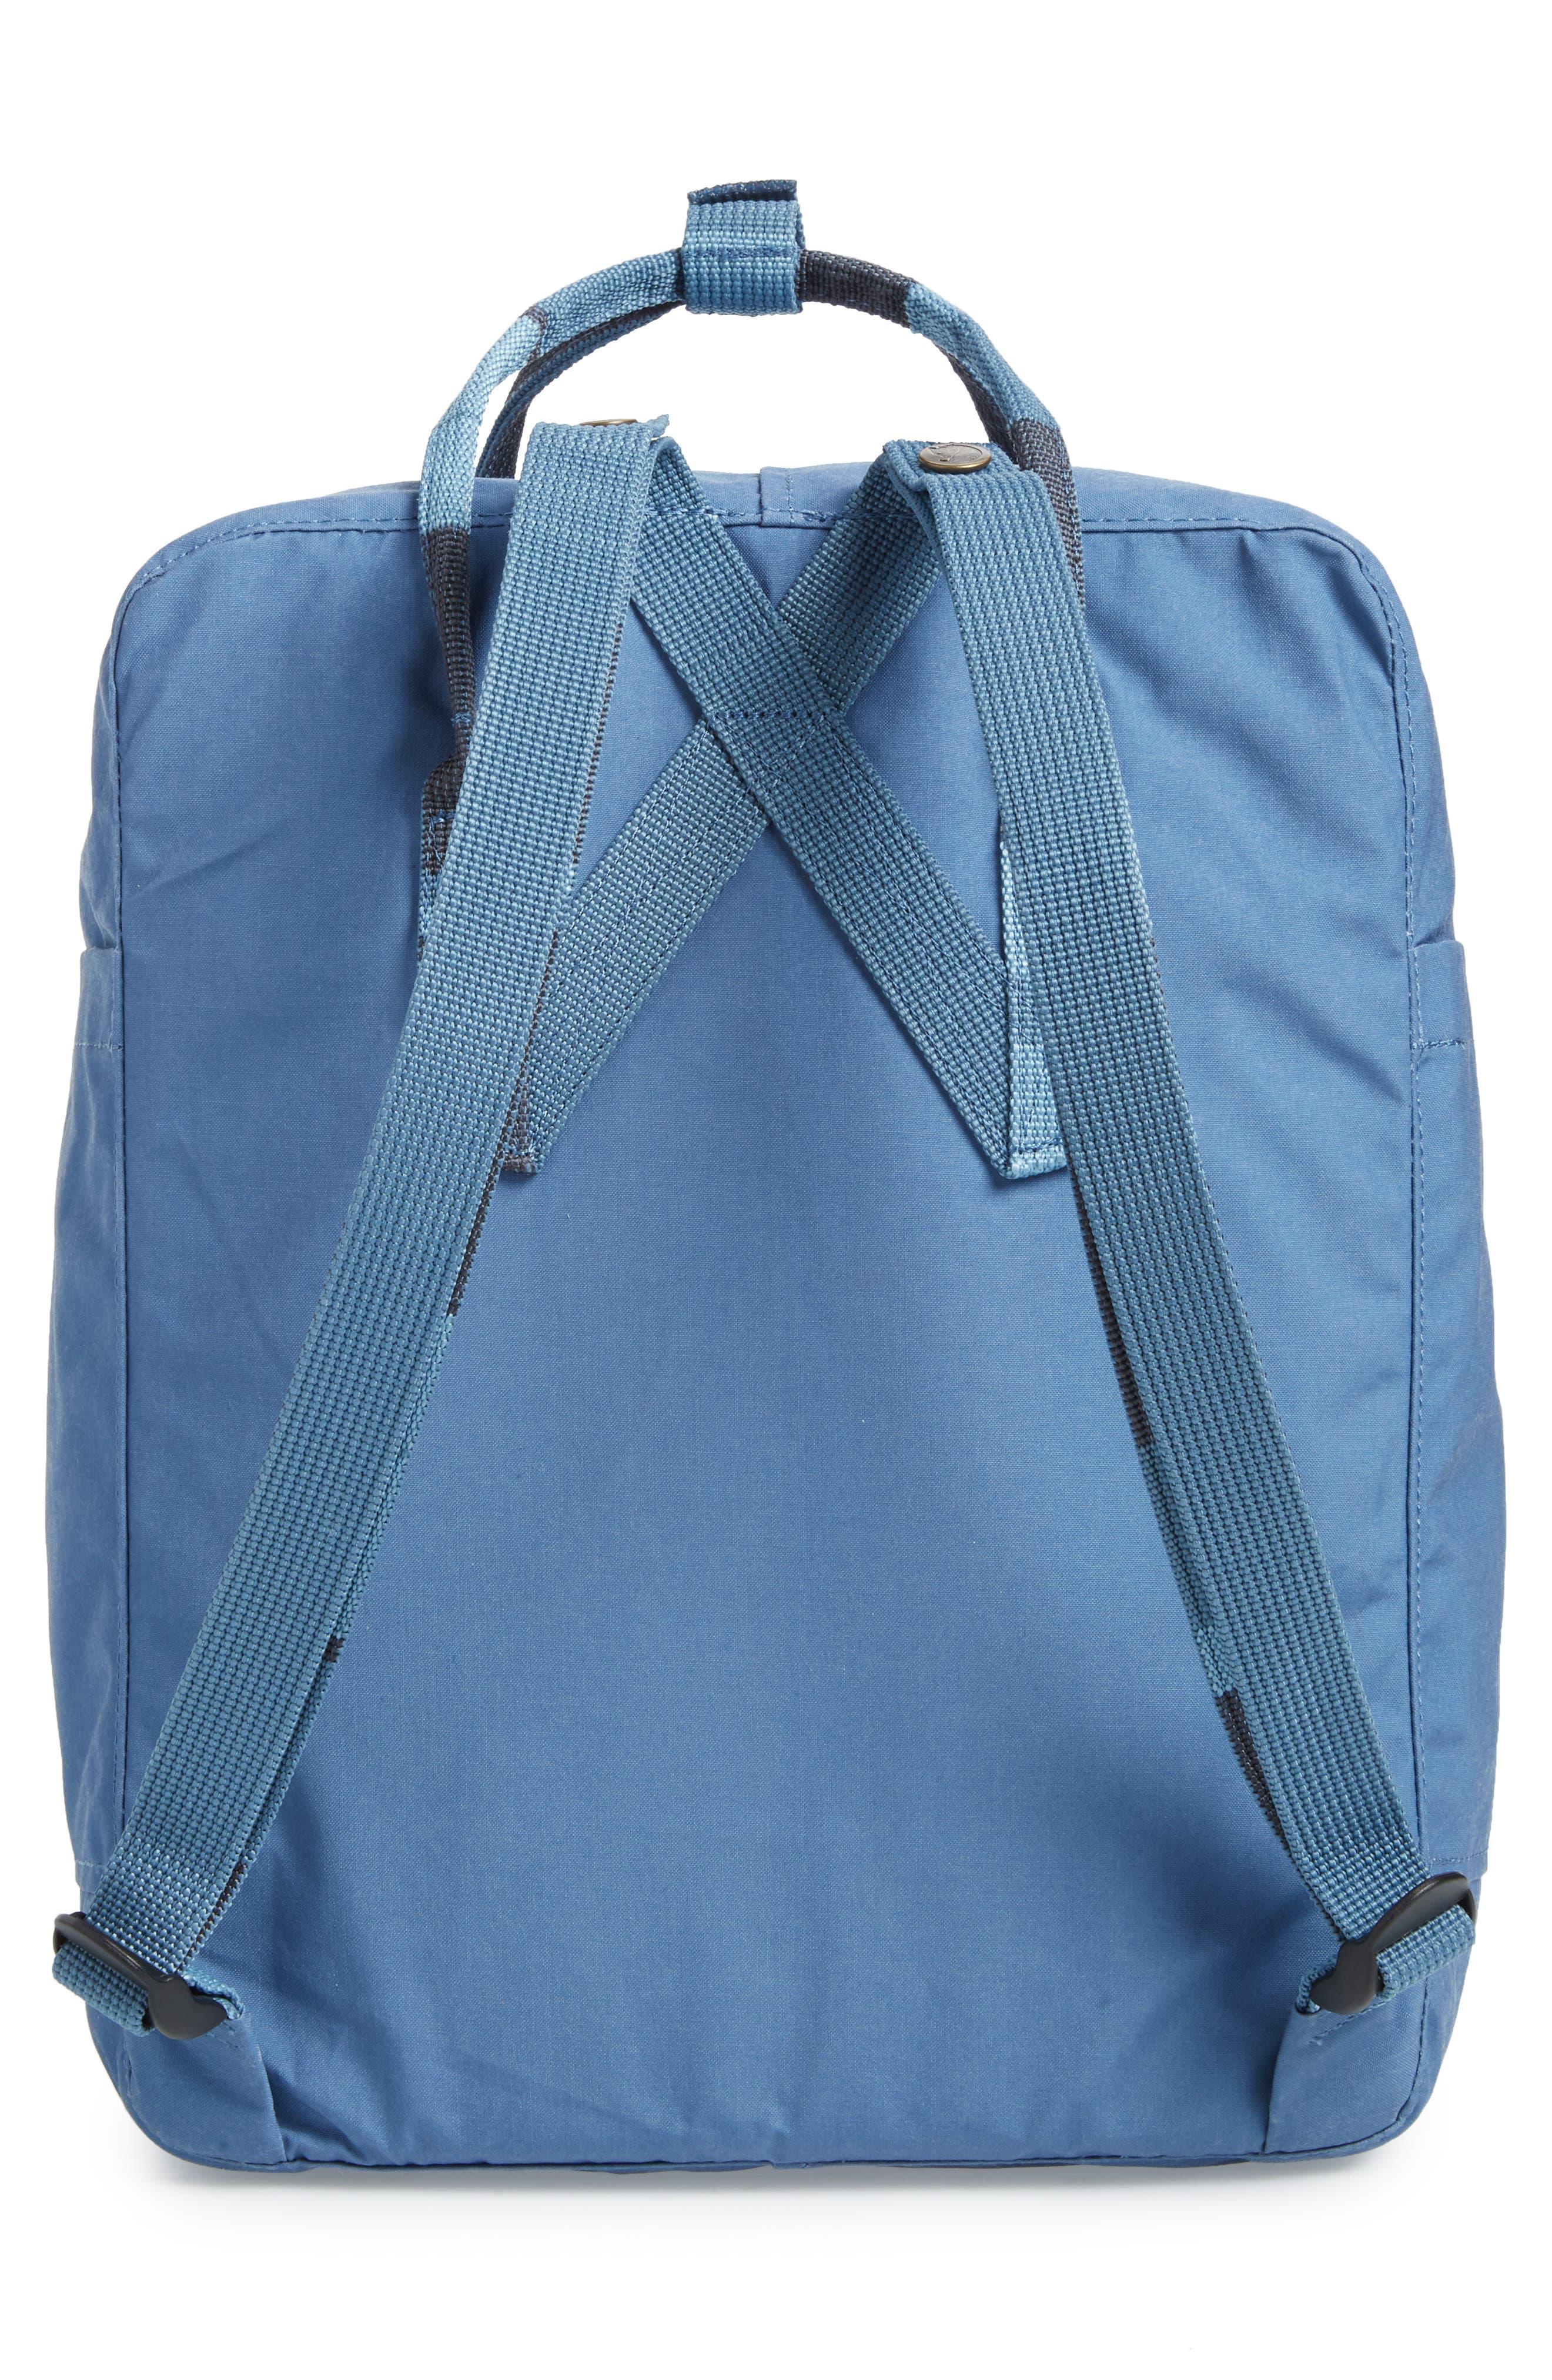 'Kånken' Water Resistant Backpack,                             Alternate thumbnail 3, color,                             Blue Ridge/ Random Blocked